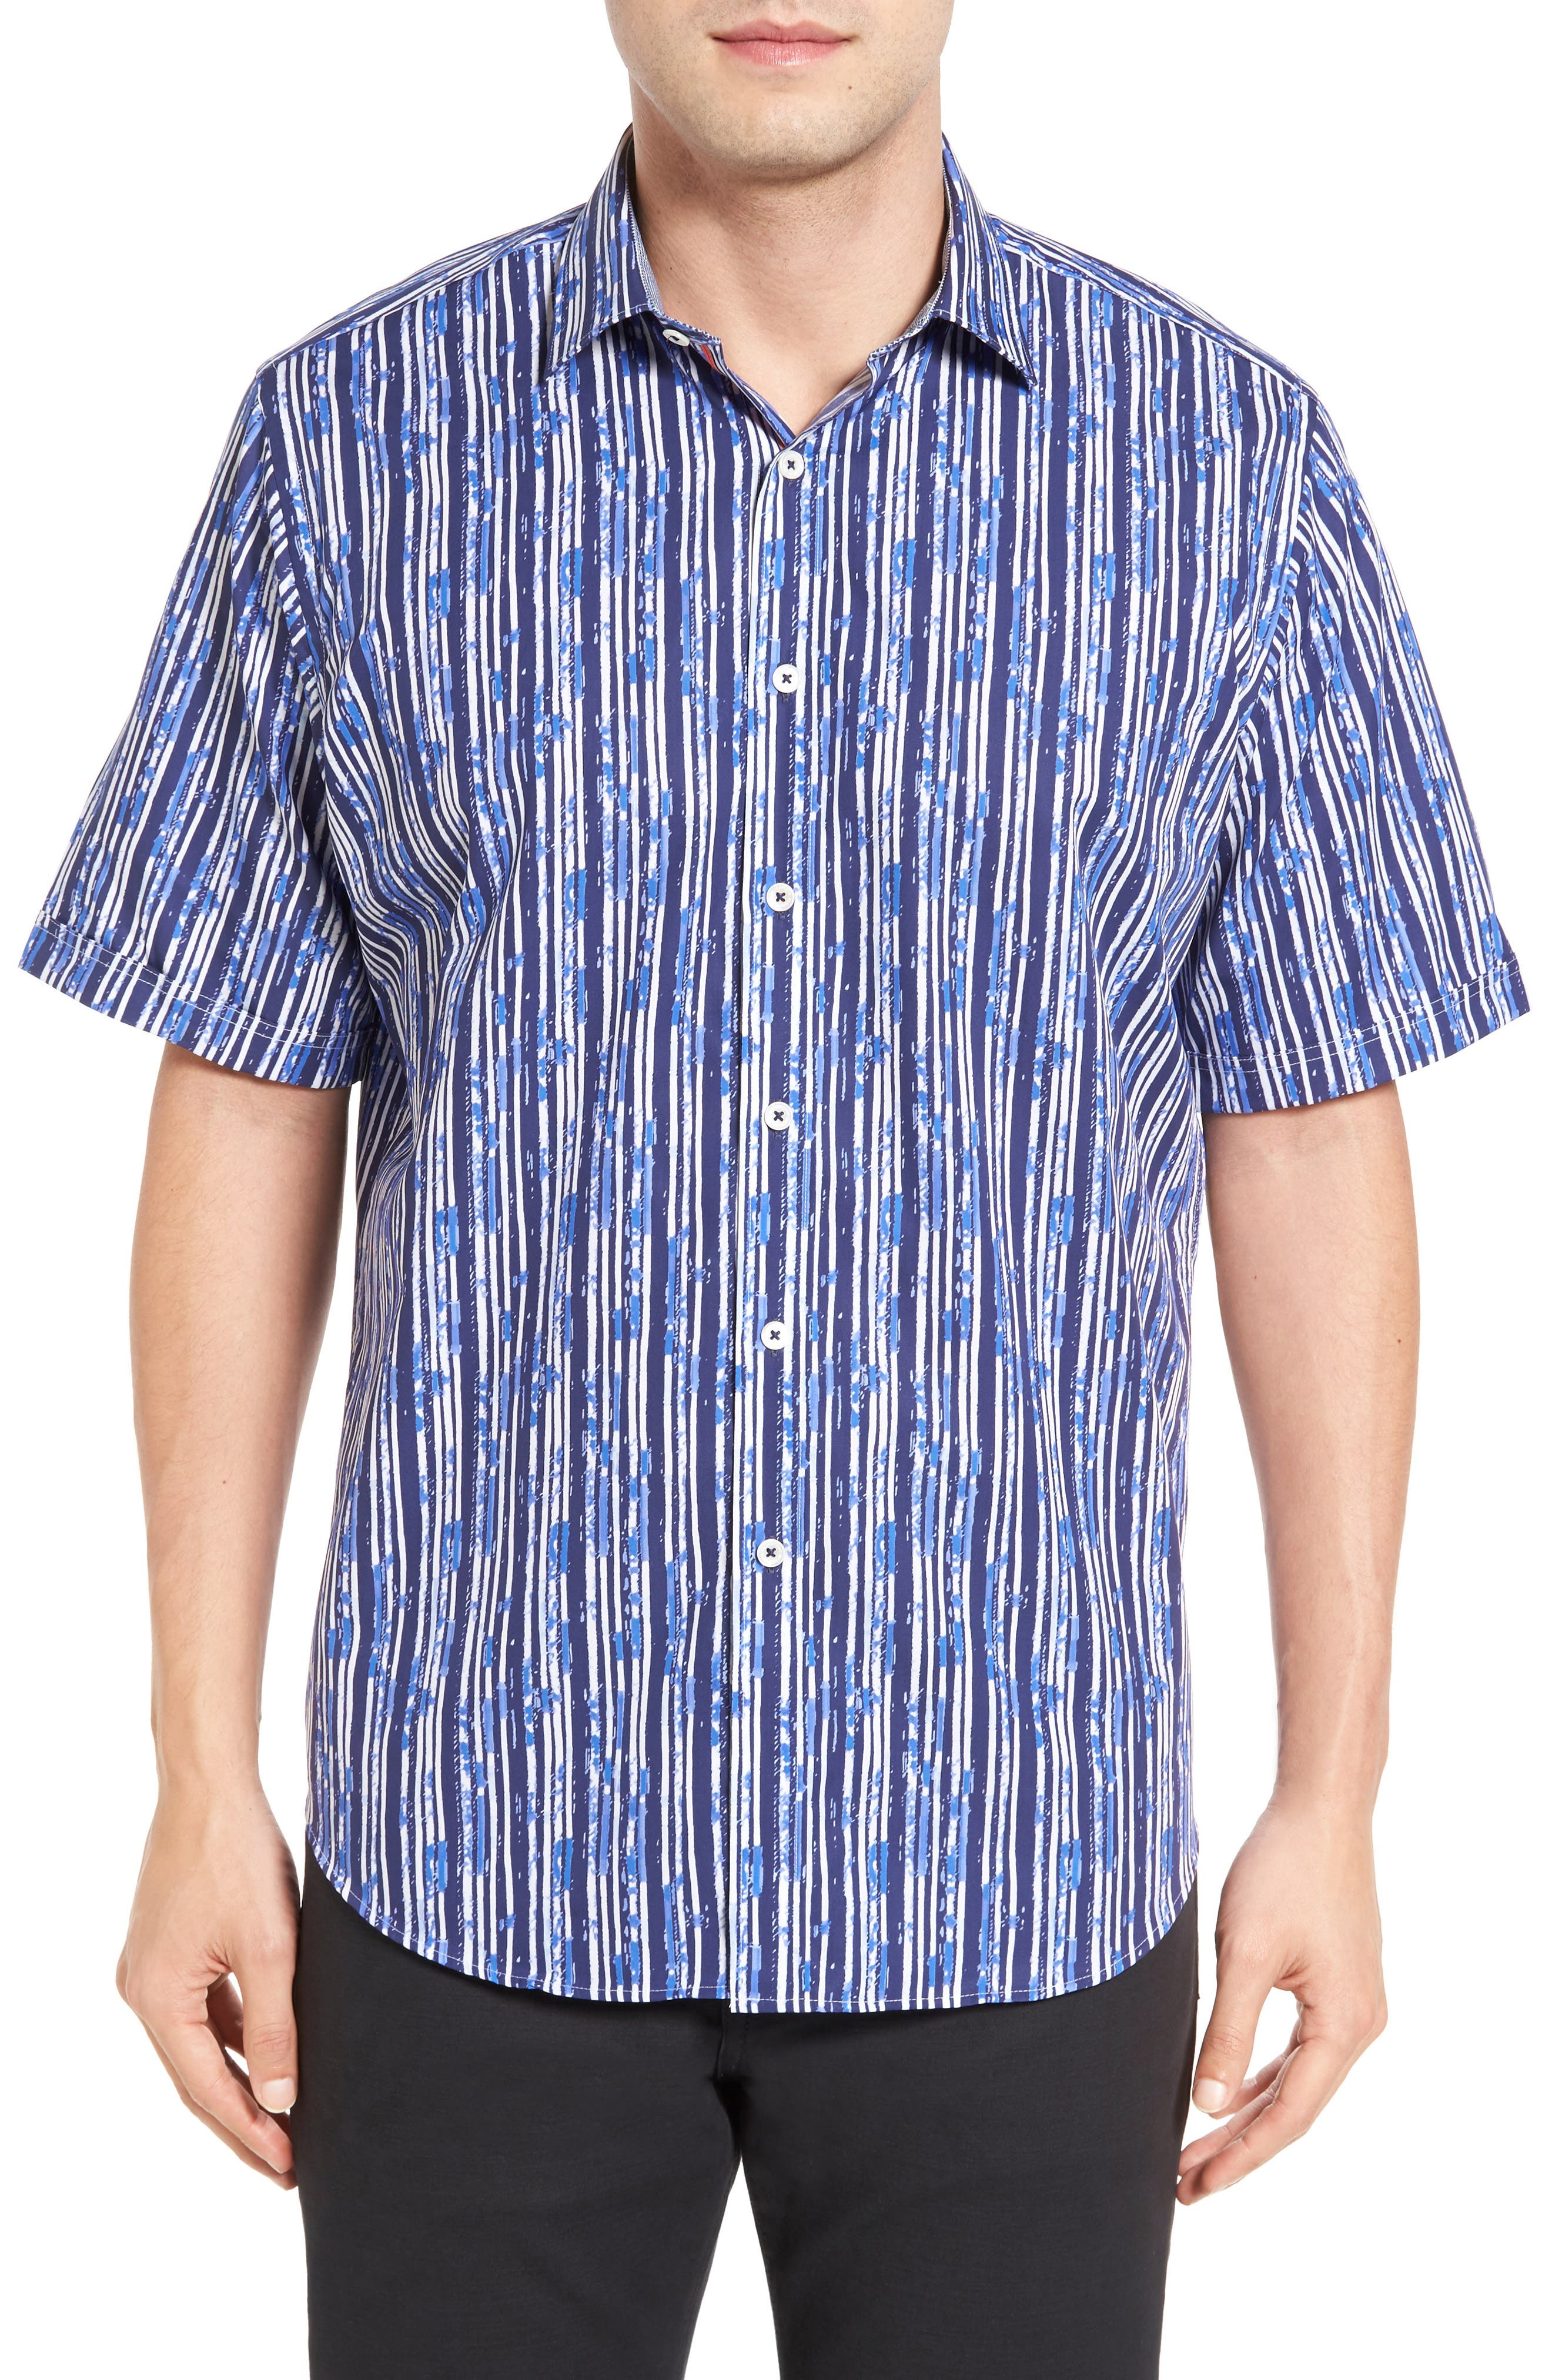 Main Image - Bugatchi Classic Fit Stripe Print Sport Shirt